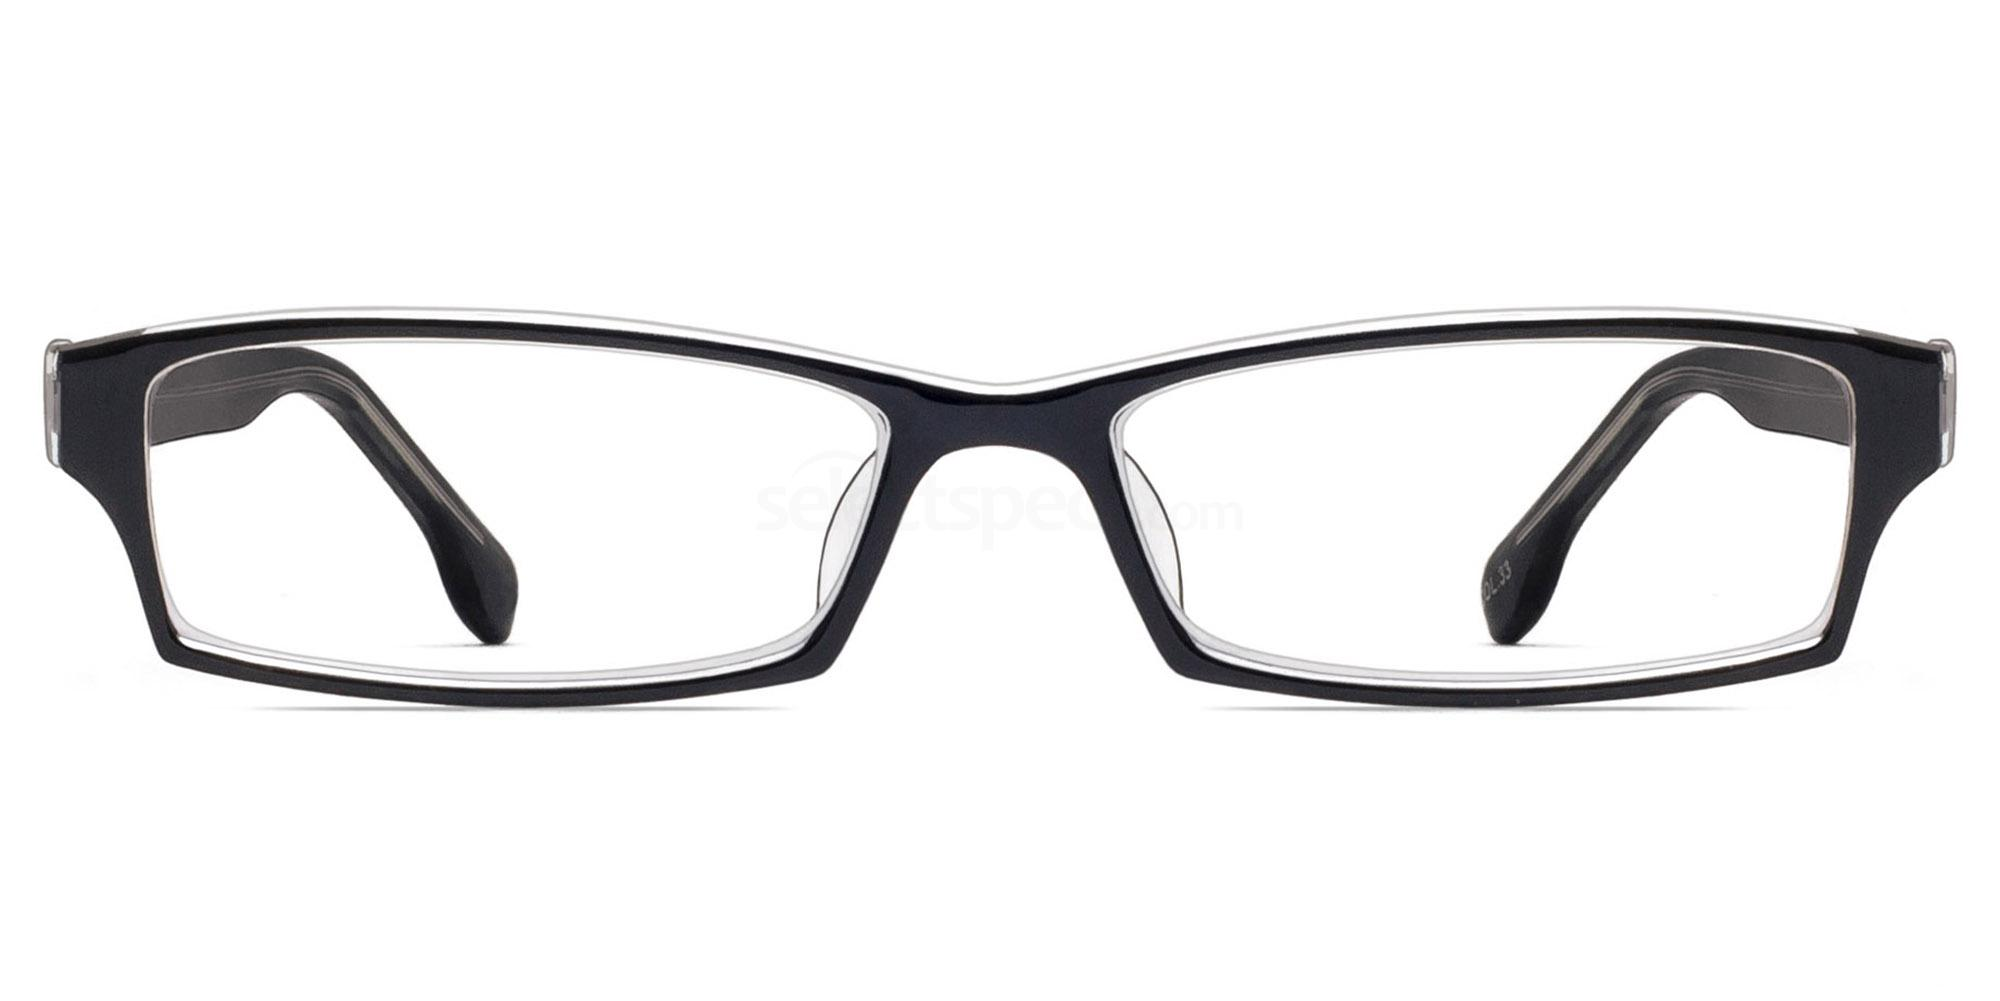 Col. 33 2381 - Black and Clear Glasses, Savannah